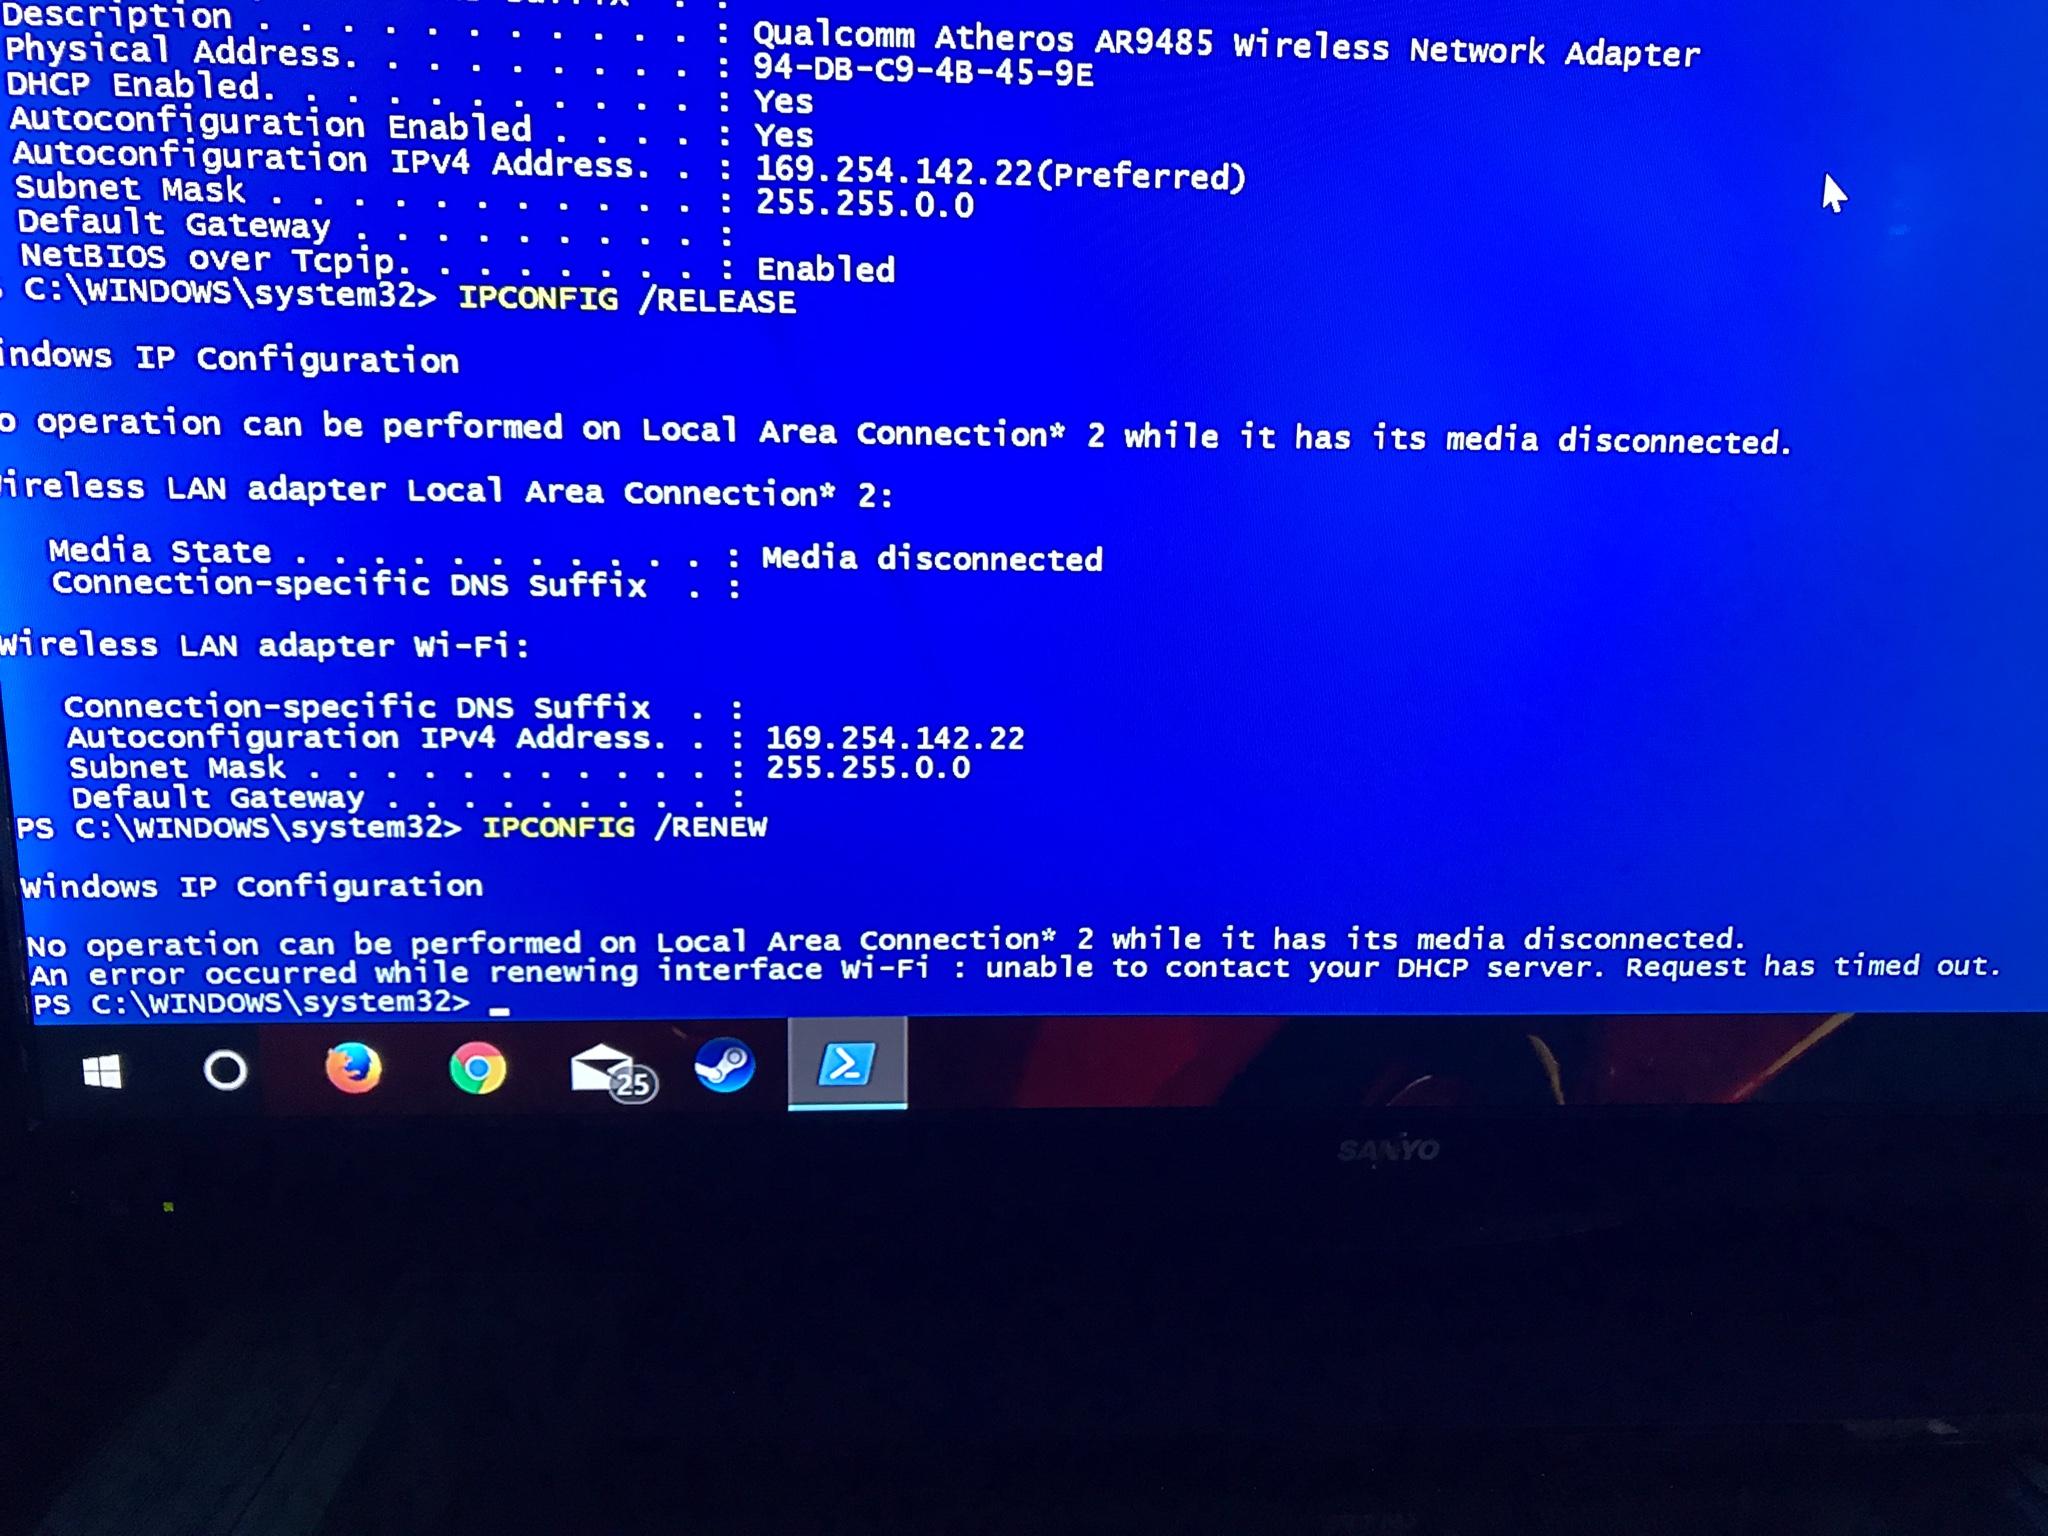 Default gateway going blank intermittently - The Cloud (Internet